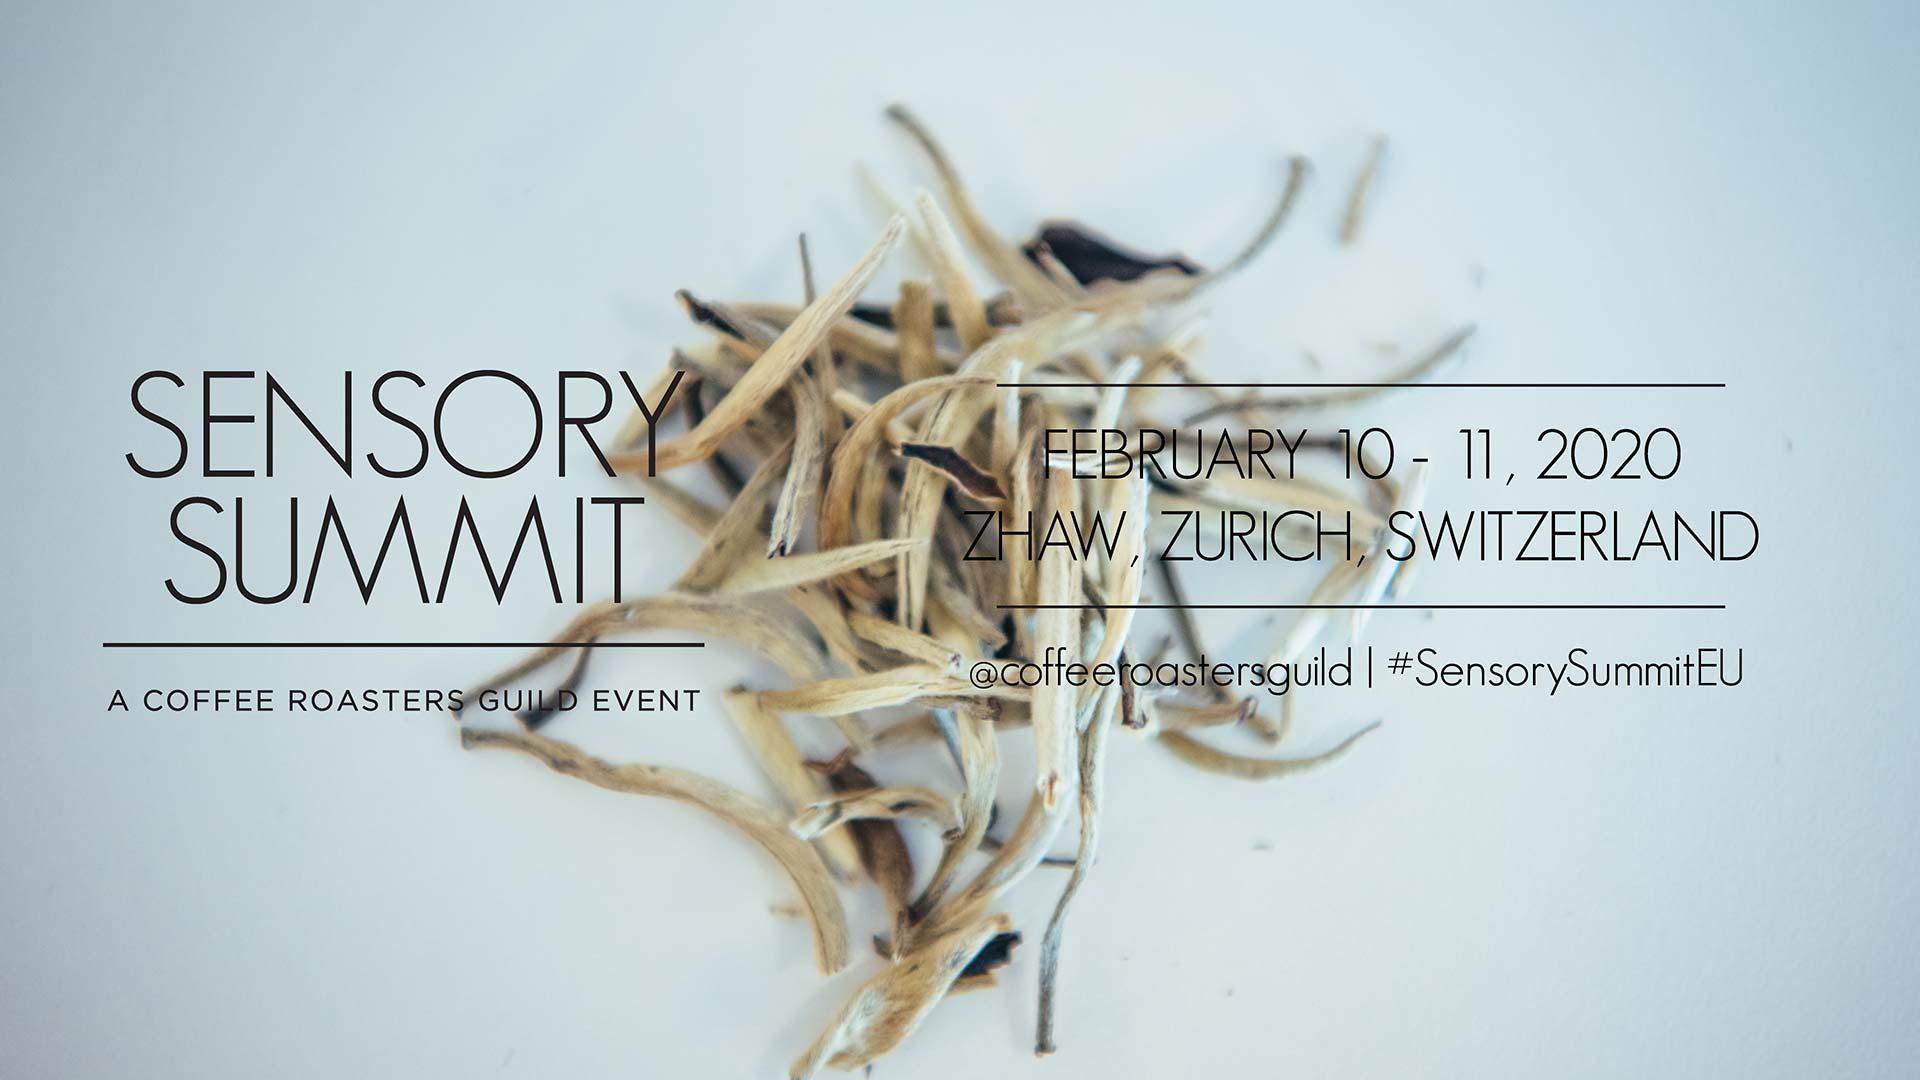 Sensory Summit 2020 Zürich, Switzerland